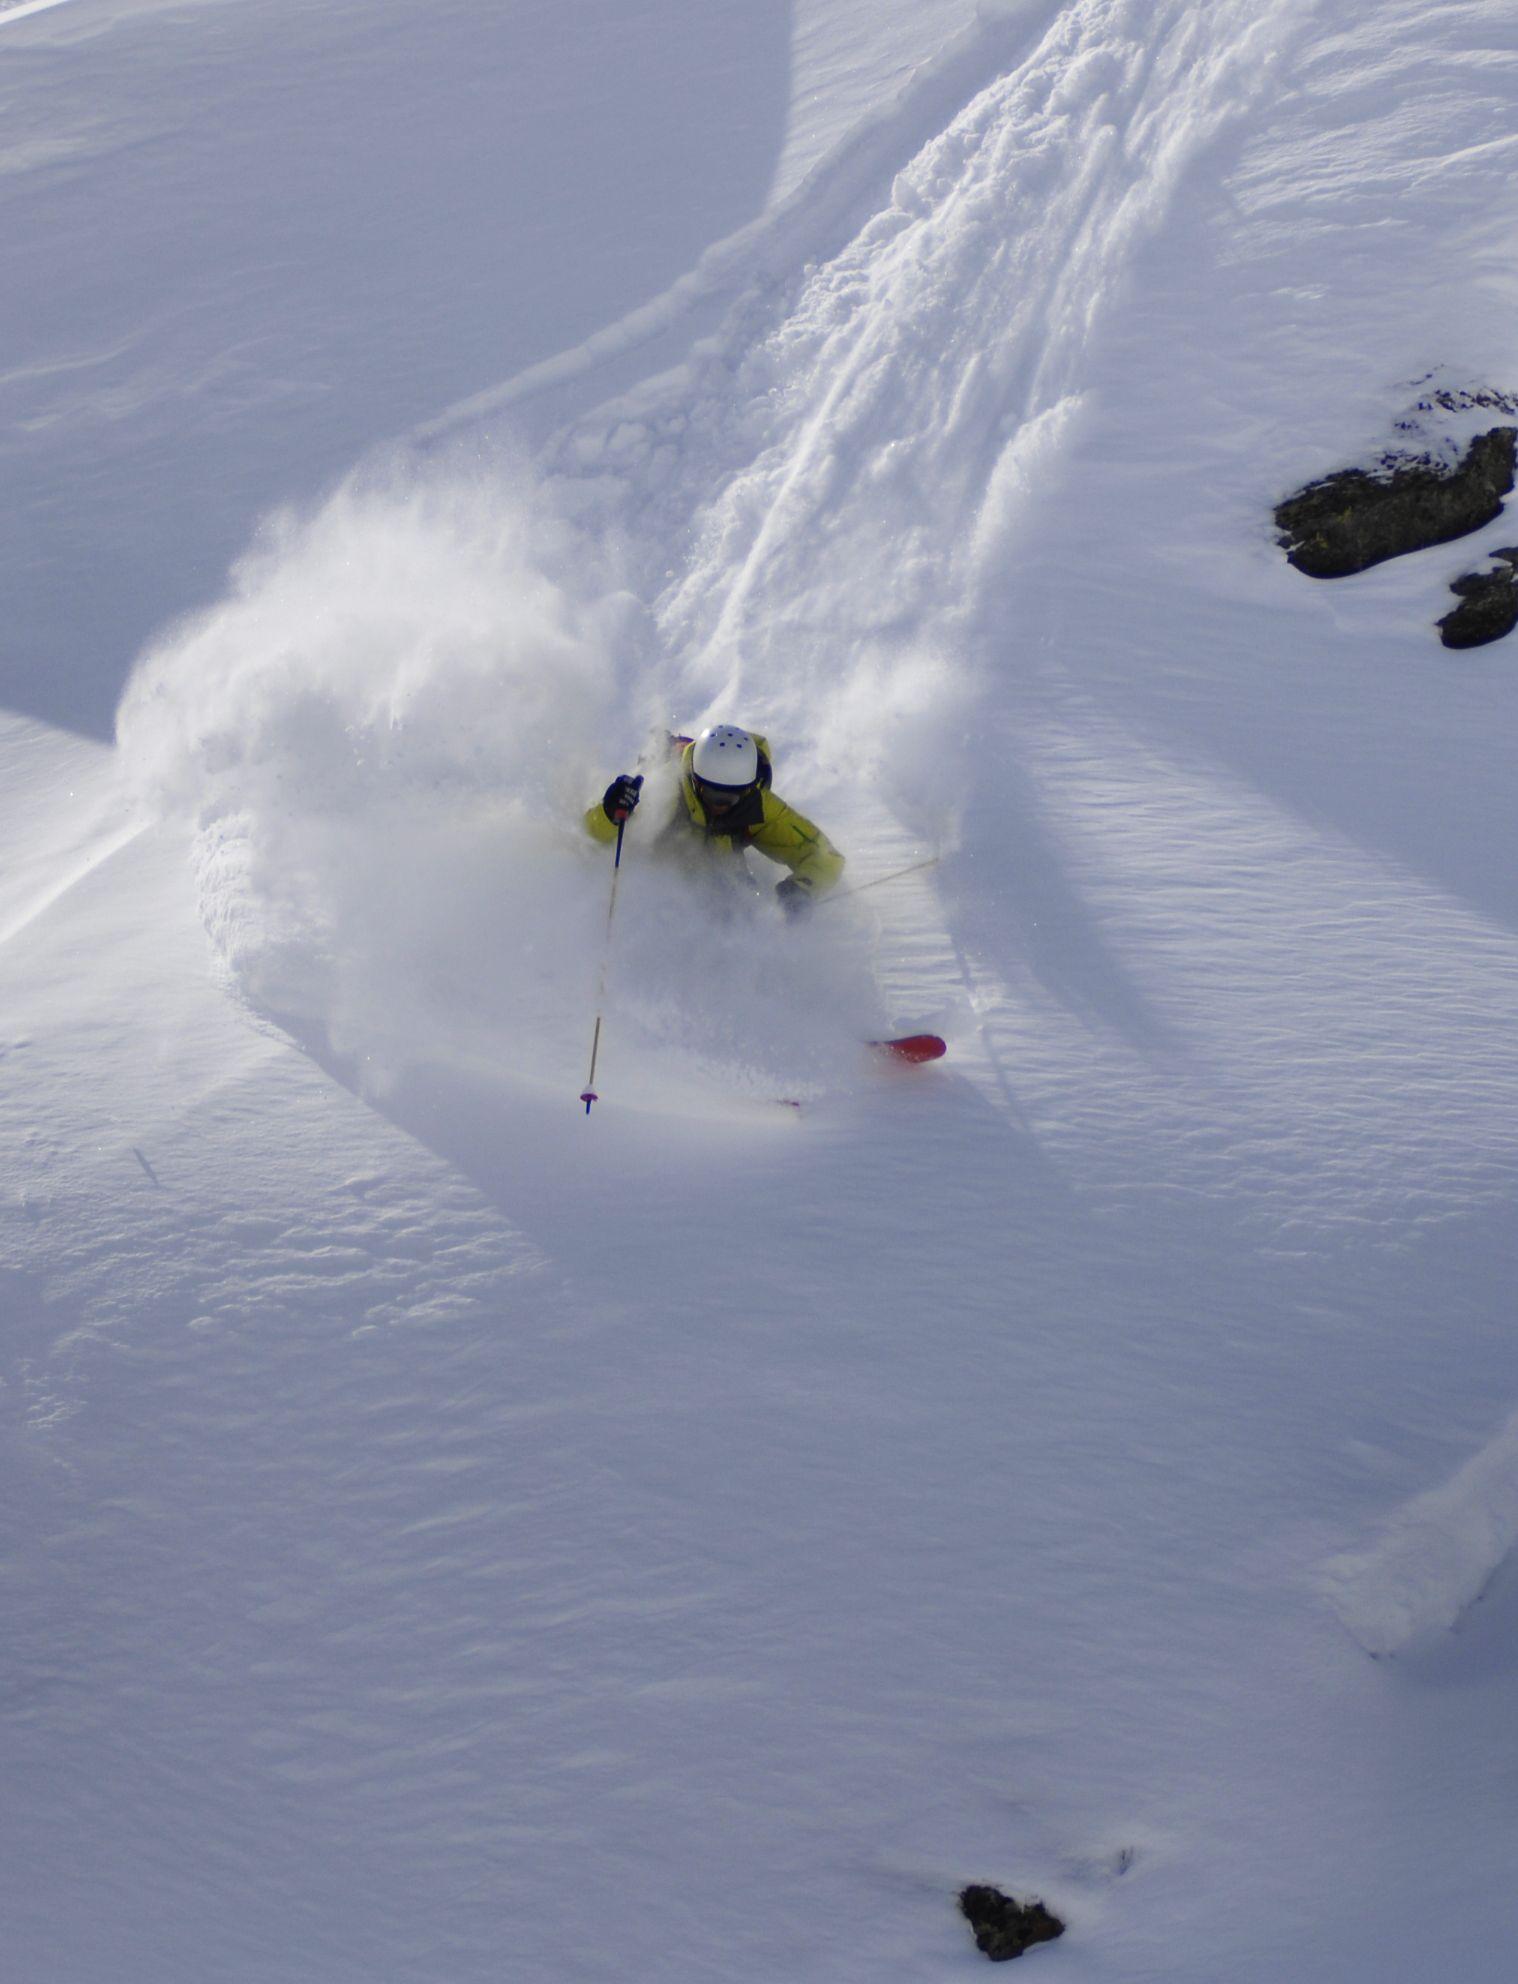 Riding Snowboarding Resorts Alpine Skiing Snow Skiing [ 1984 x 1518 Pixel ]